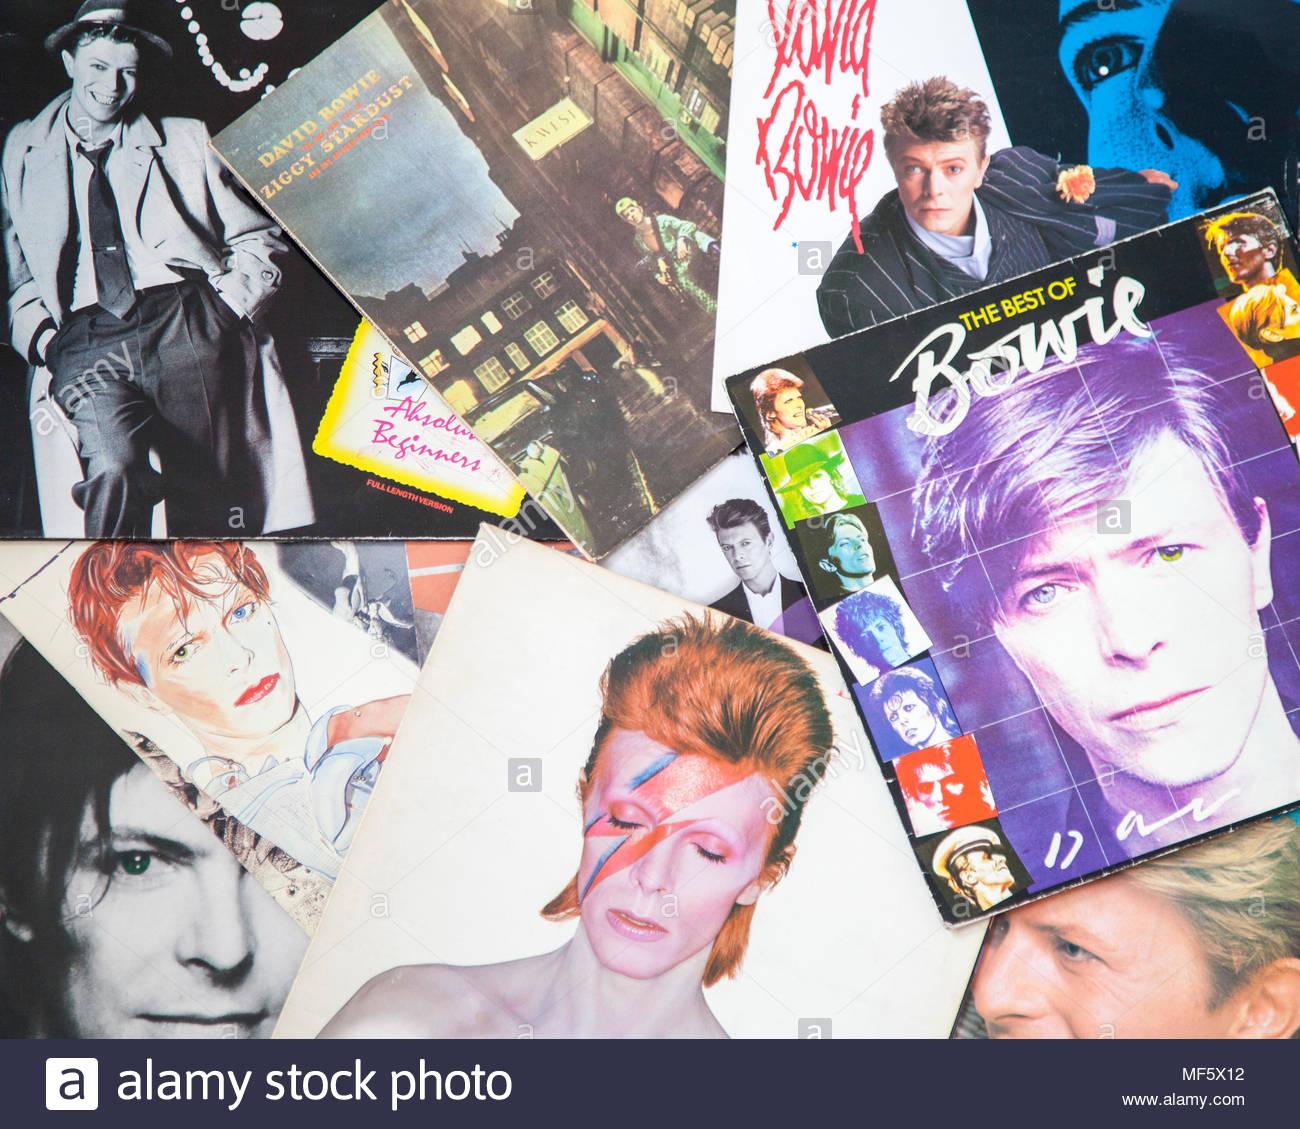 Album Covers Stock Photos & Album Covers Stock Images - Alamy